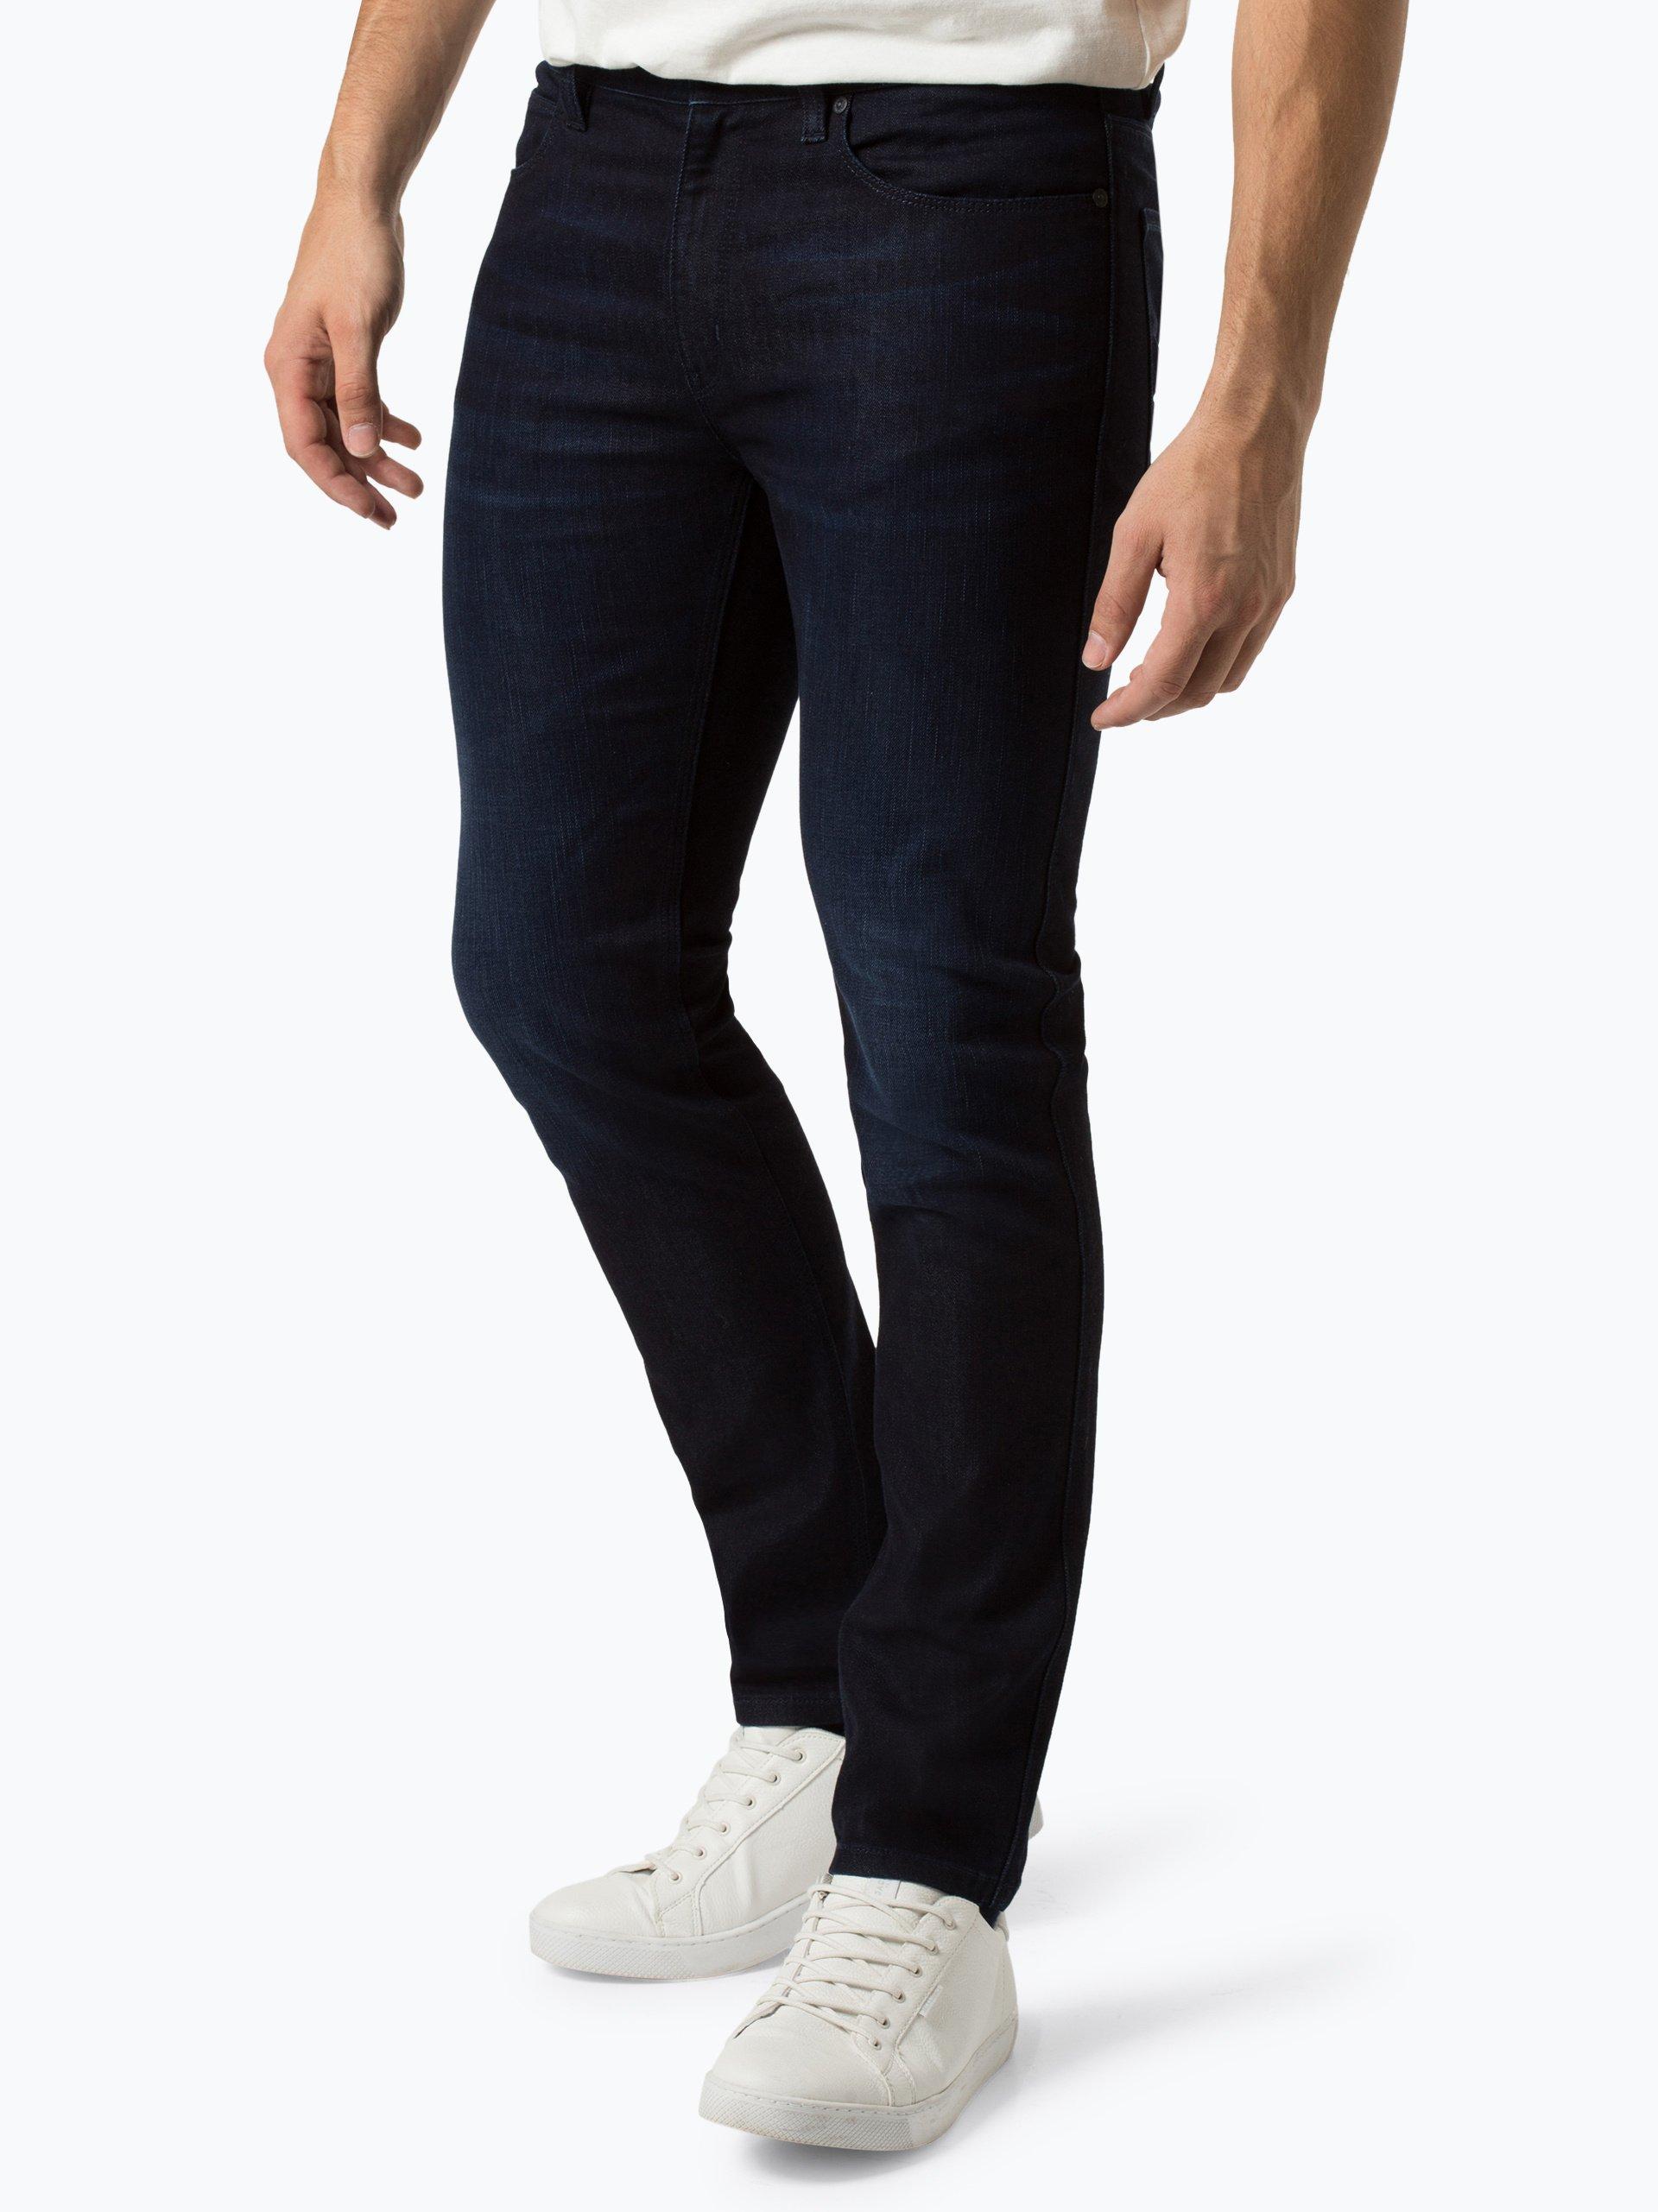 HUGO Herren Jeans - HUGO 743